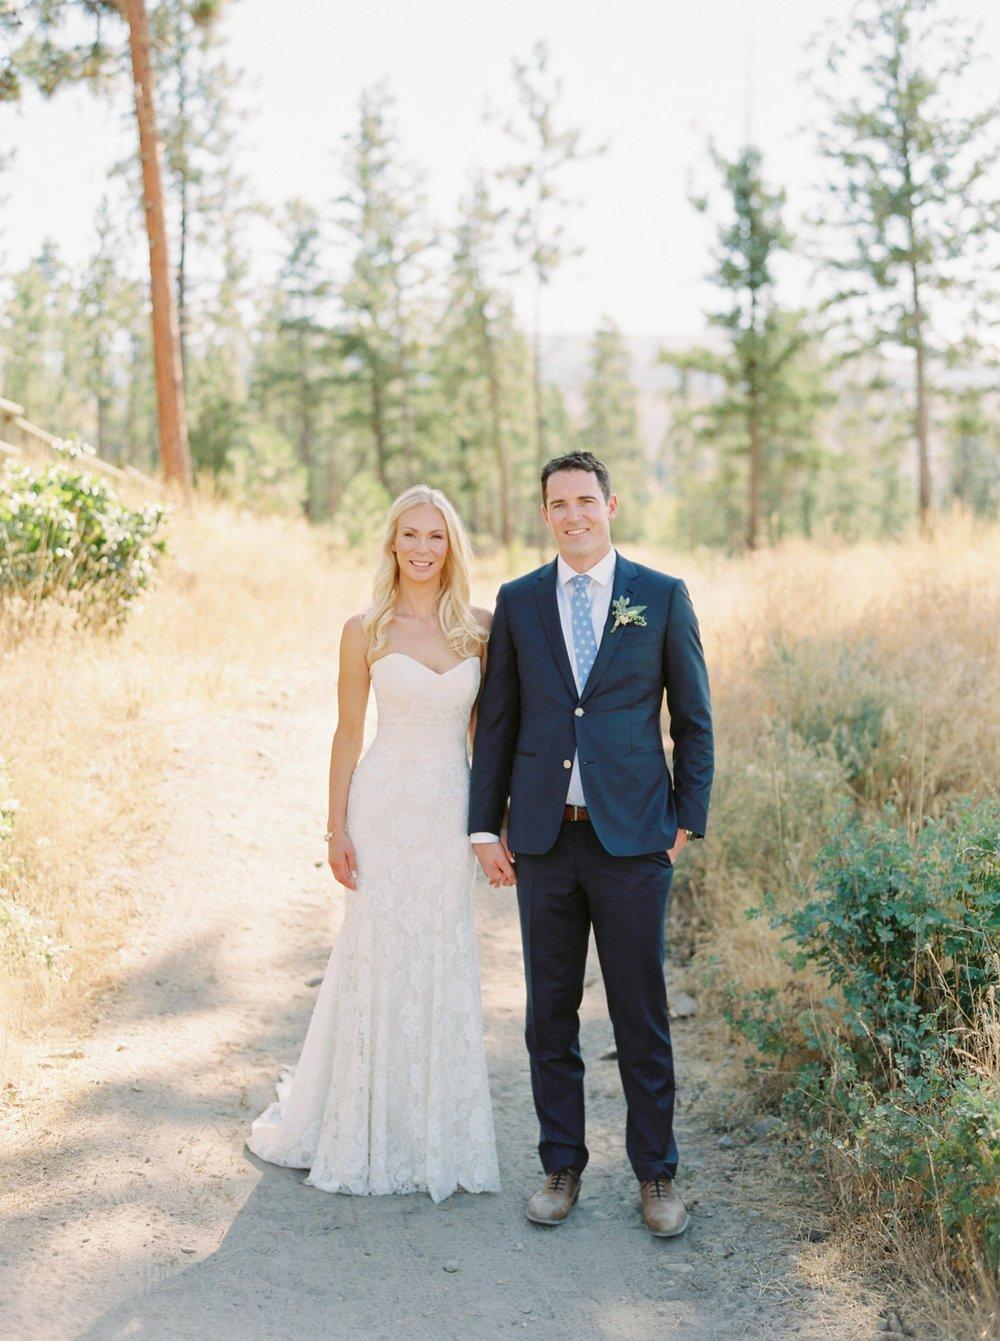 Kelowna wedding photographers | hotel eldorado wedding photographer | justine milton fine art film photography | bride and groom | bride and groom portrait | bride and groom holding hands